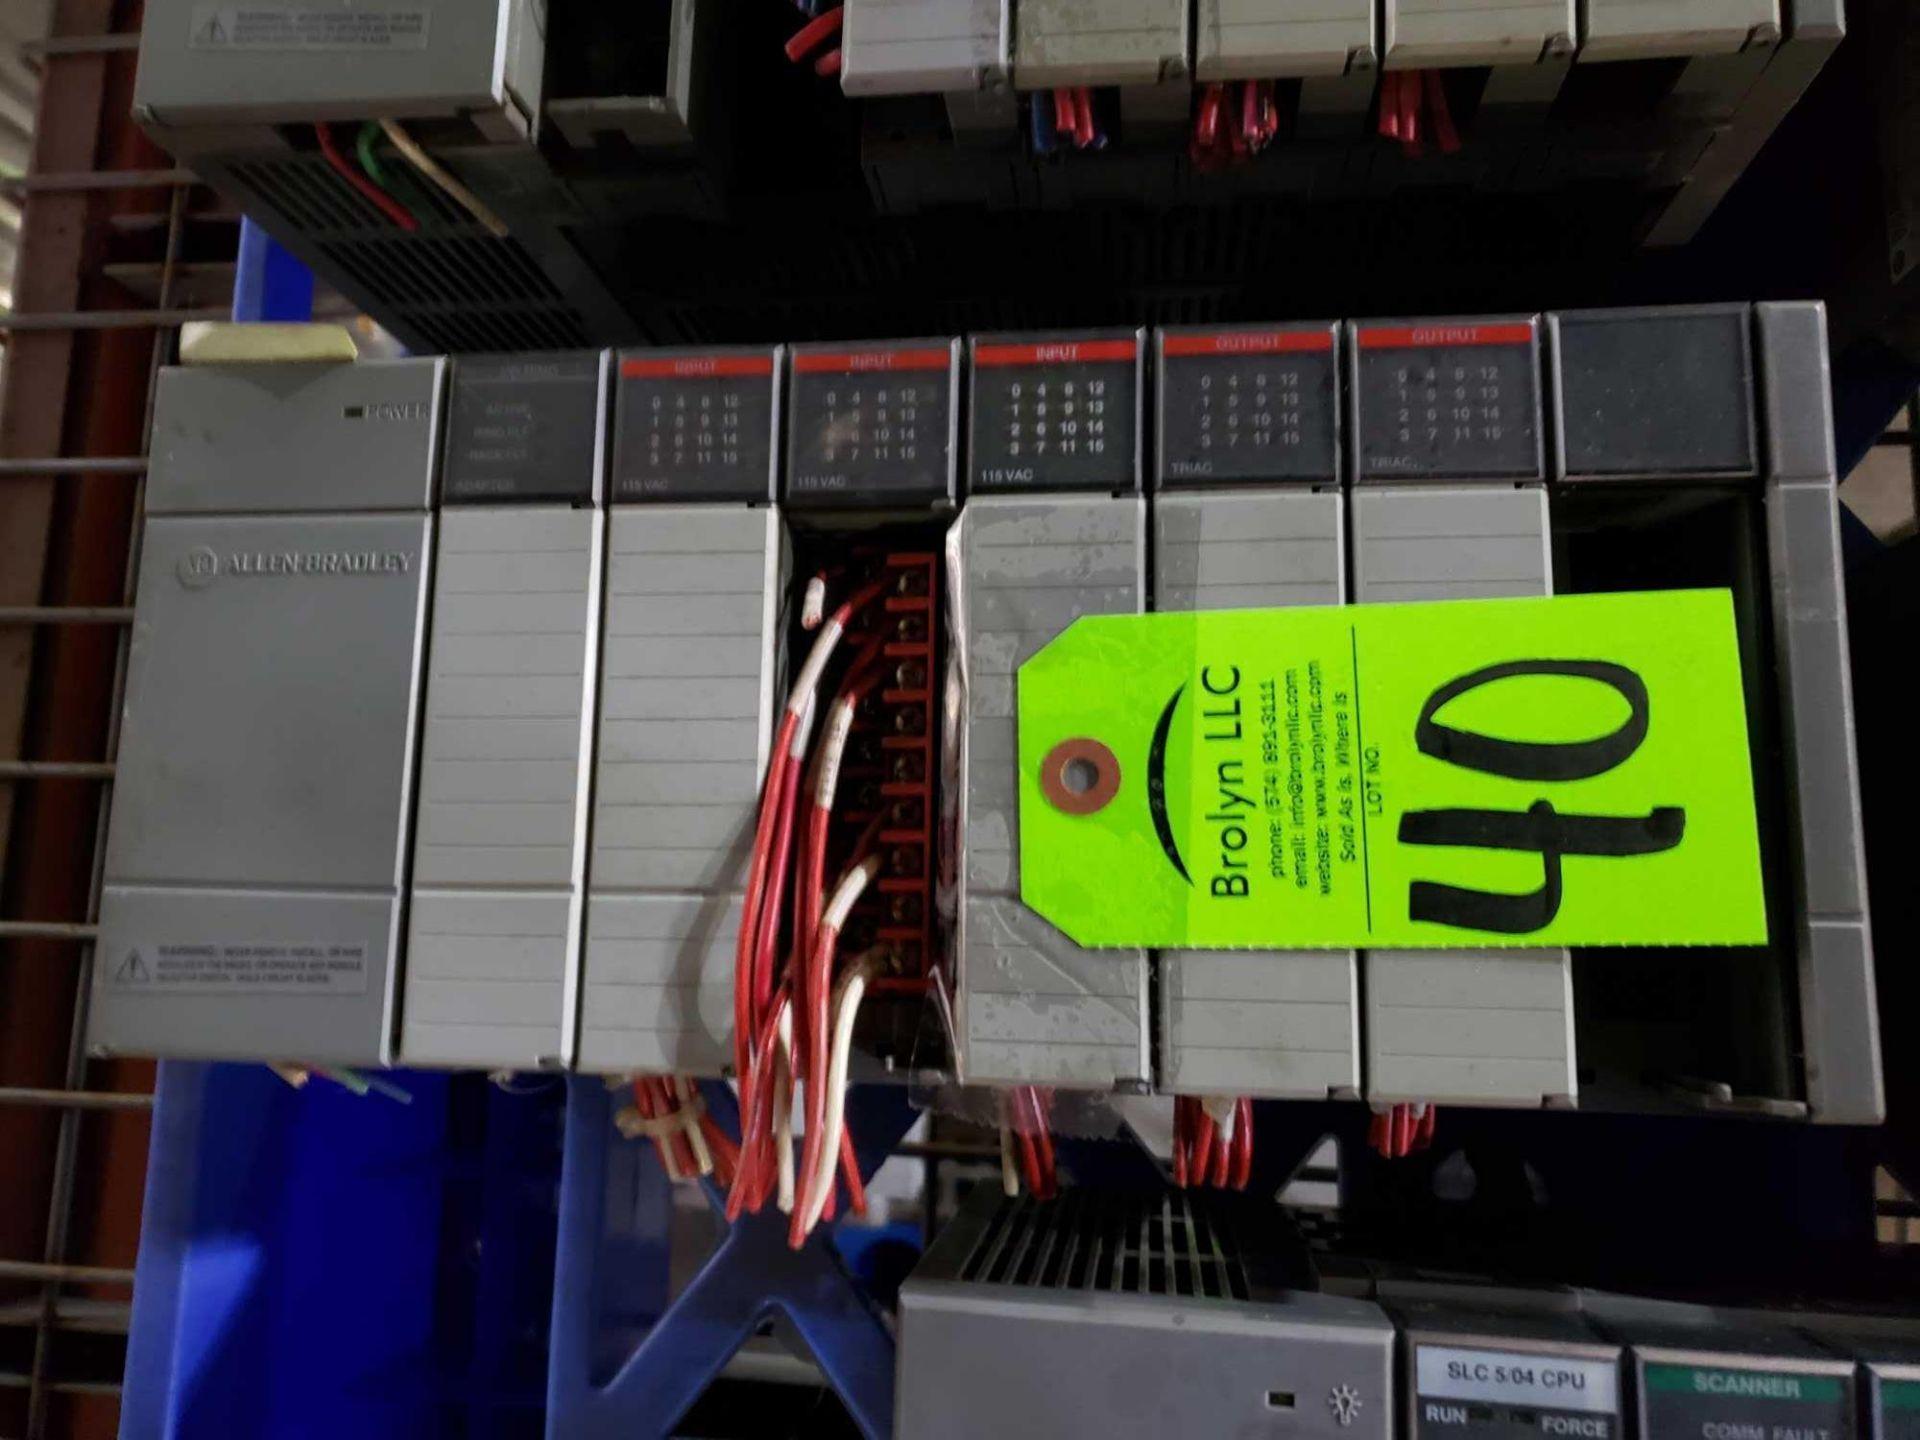 Lot 40 - Allen Bradley SLC500 rack as pictured.